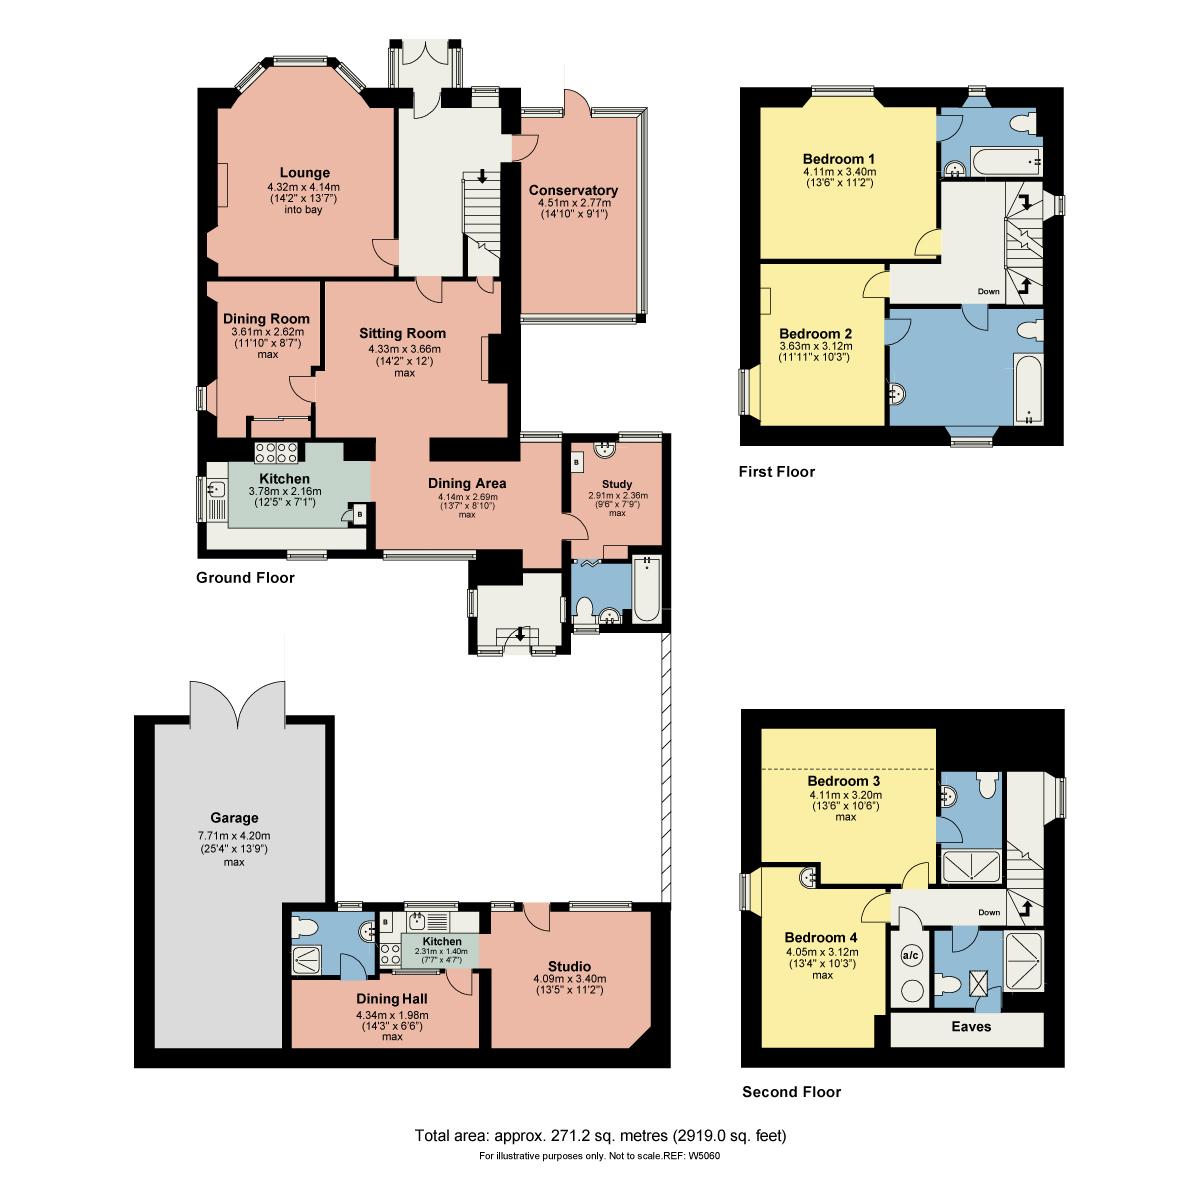 Floorplan Lindisfarne, Sunny Bank Road, Windermere, Cumbria, LA23 2EN